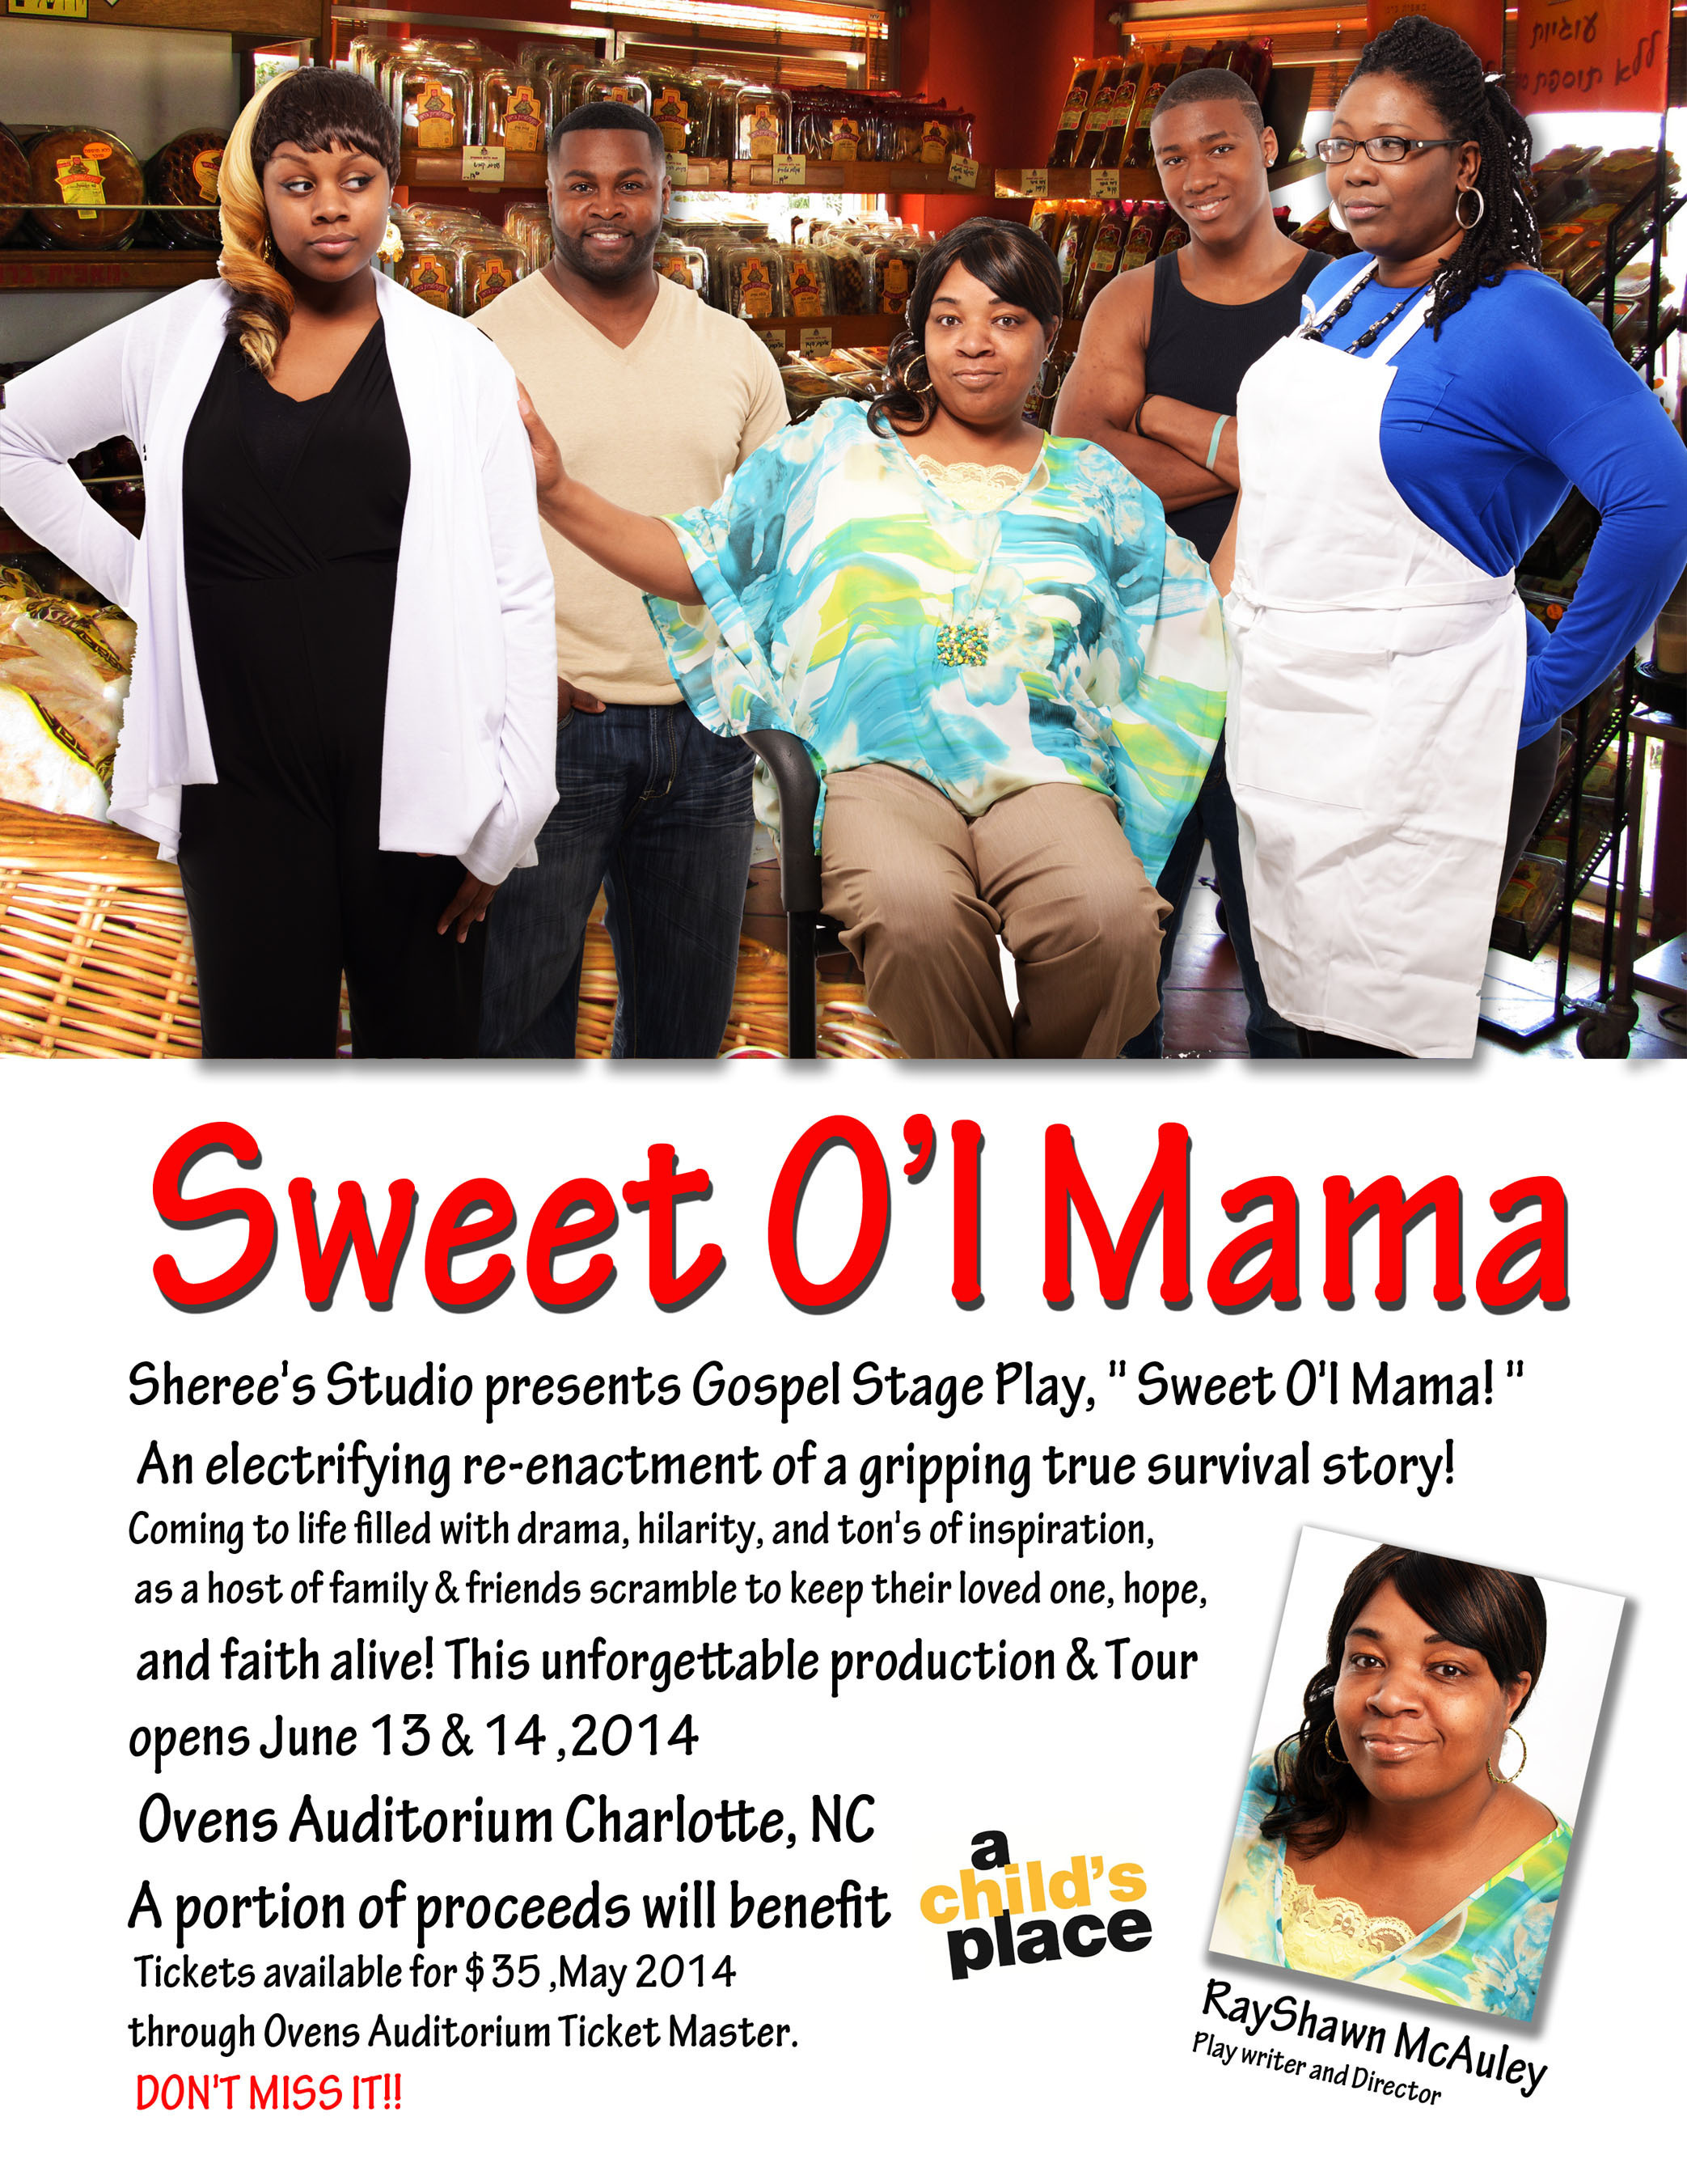 SWEET O'L MAMA Memoir is Released